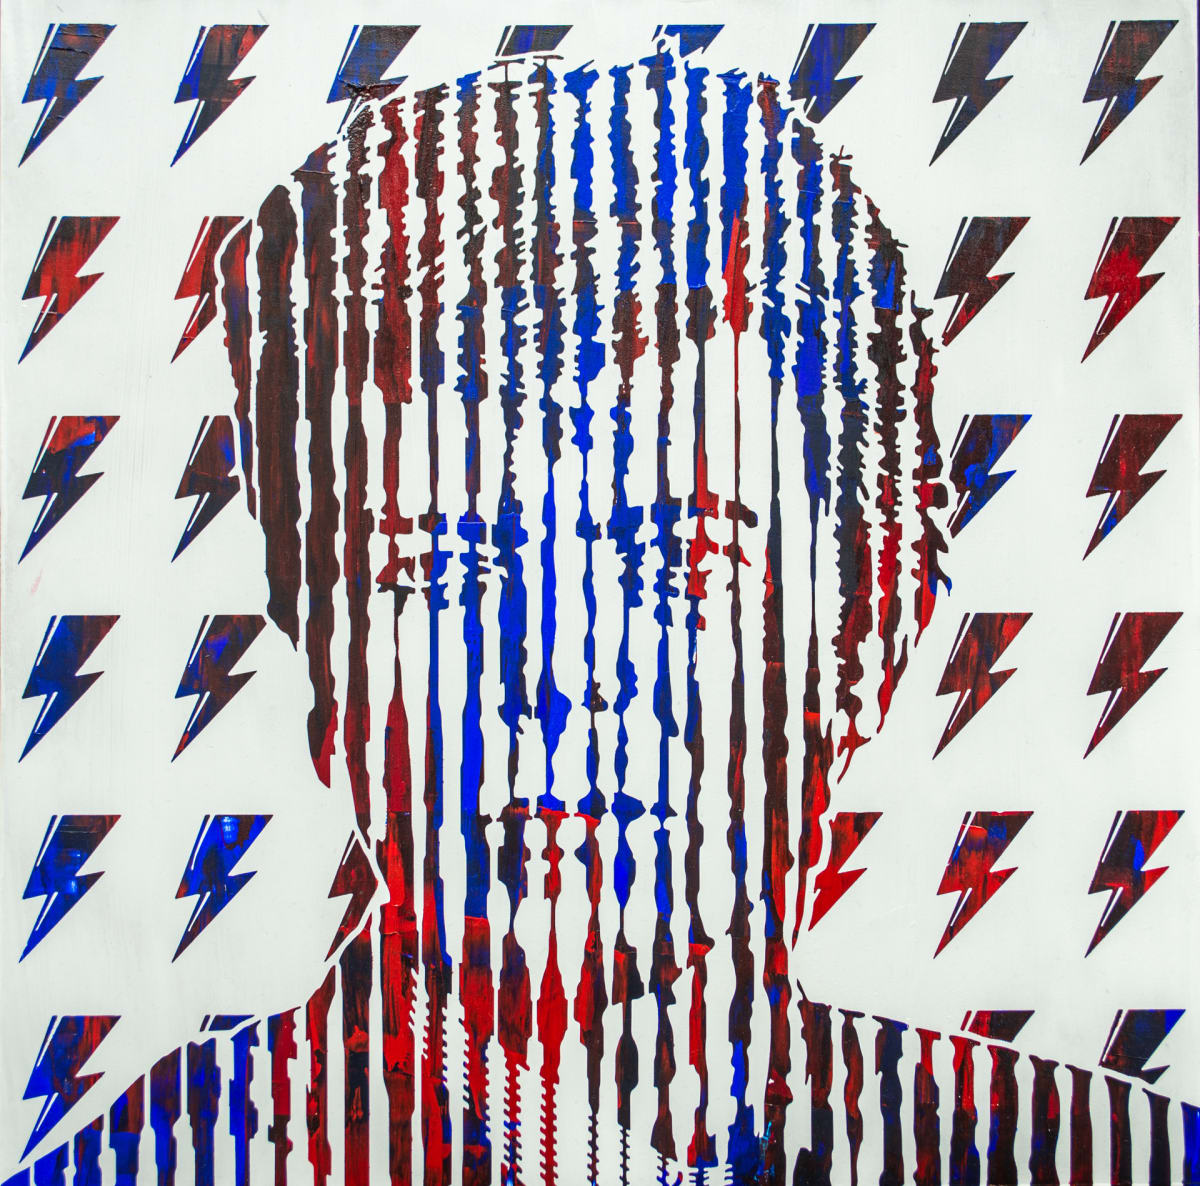 Bowie III by Sean Christopher Ward